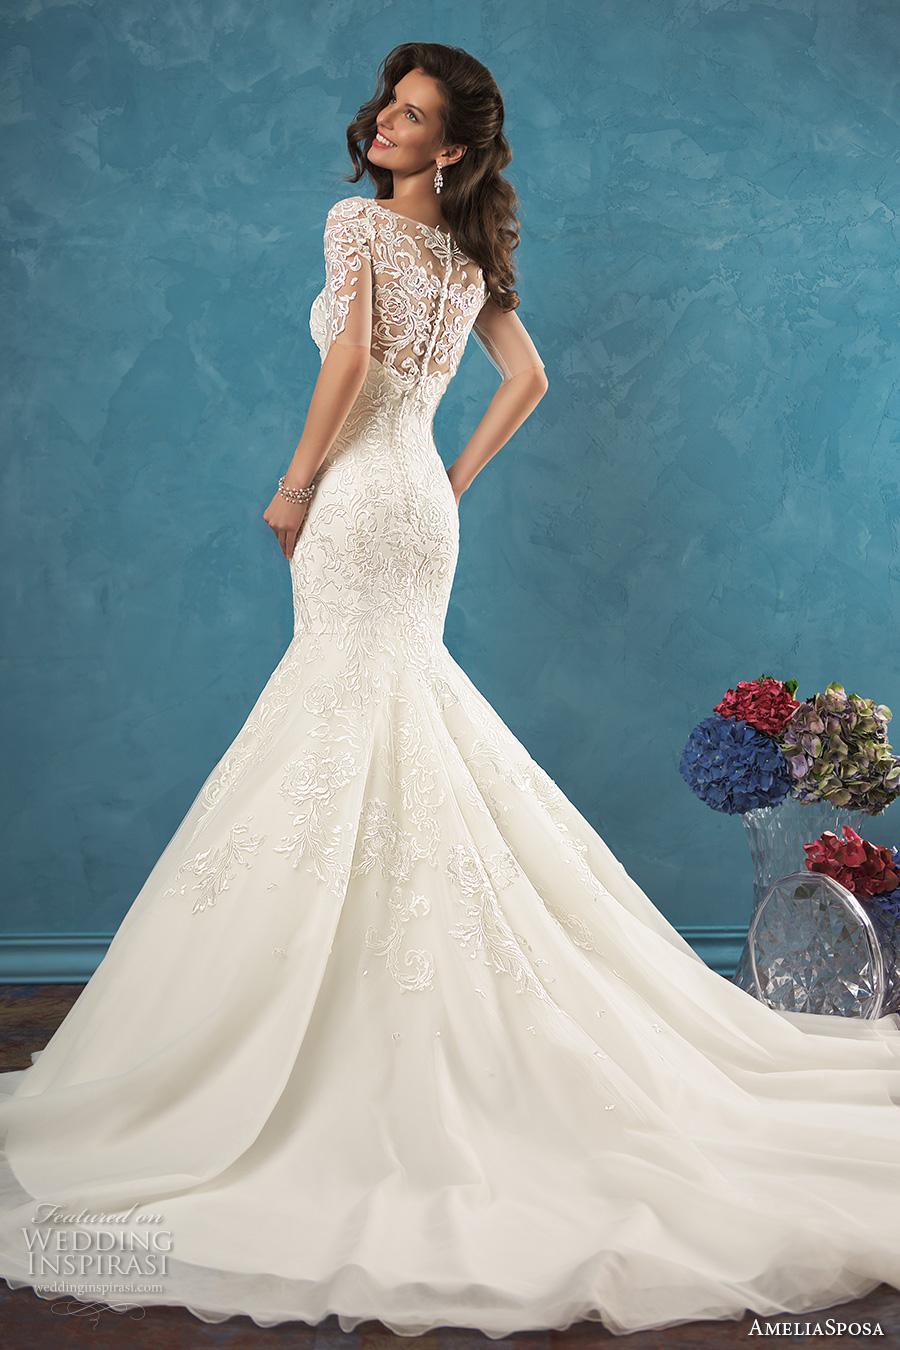 amelia sposa 2017 bridal half sleeves illusion bateau sweetheart neckline beautiful elegant mermaid wedding dress lace back cathedral train (alina) bv